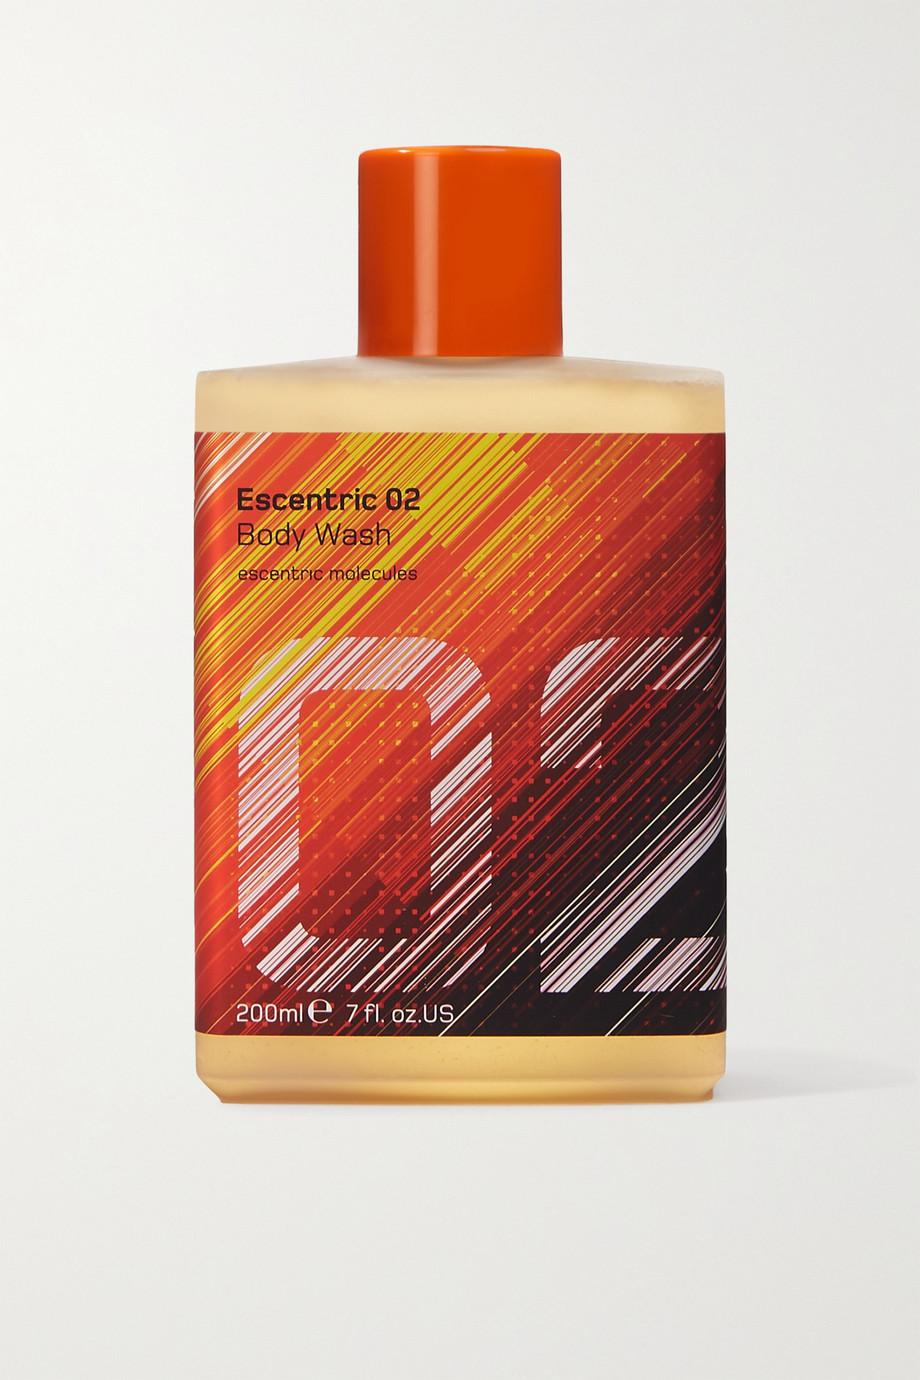 Escentric Molecules Escentric 02 Body Wash, 200 ml – Waschgel